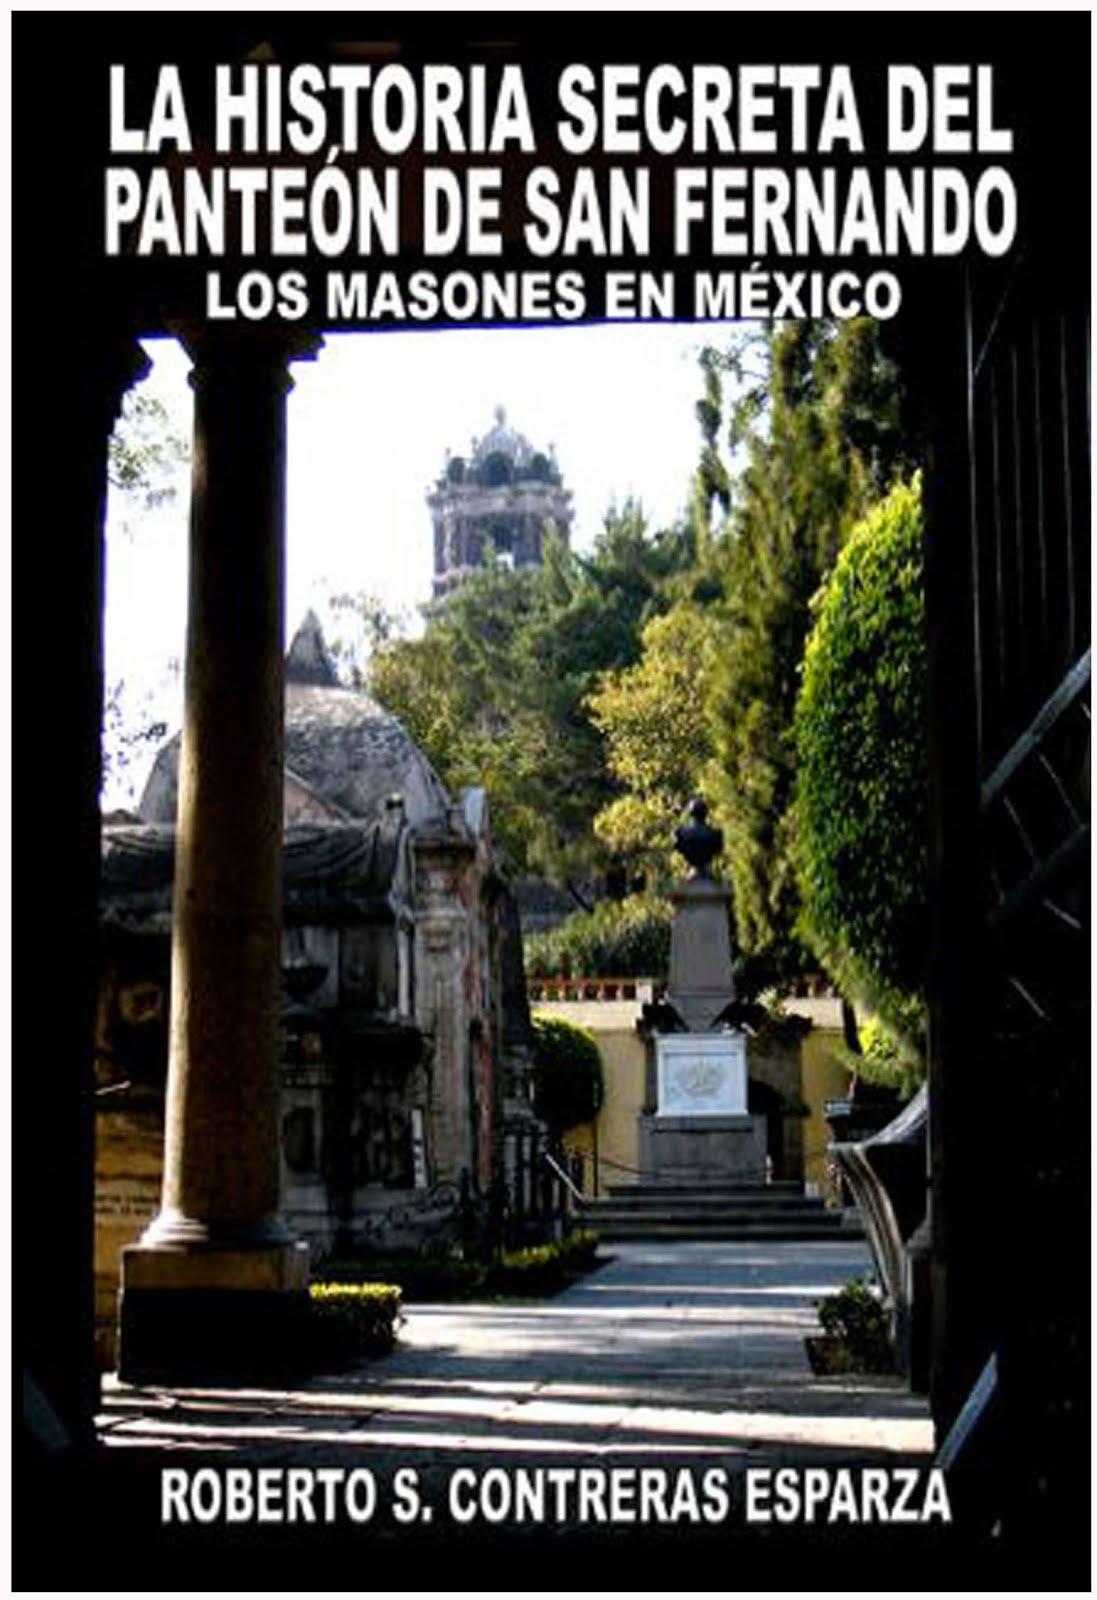 ELLOS ERAN MASONES